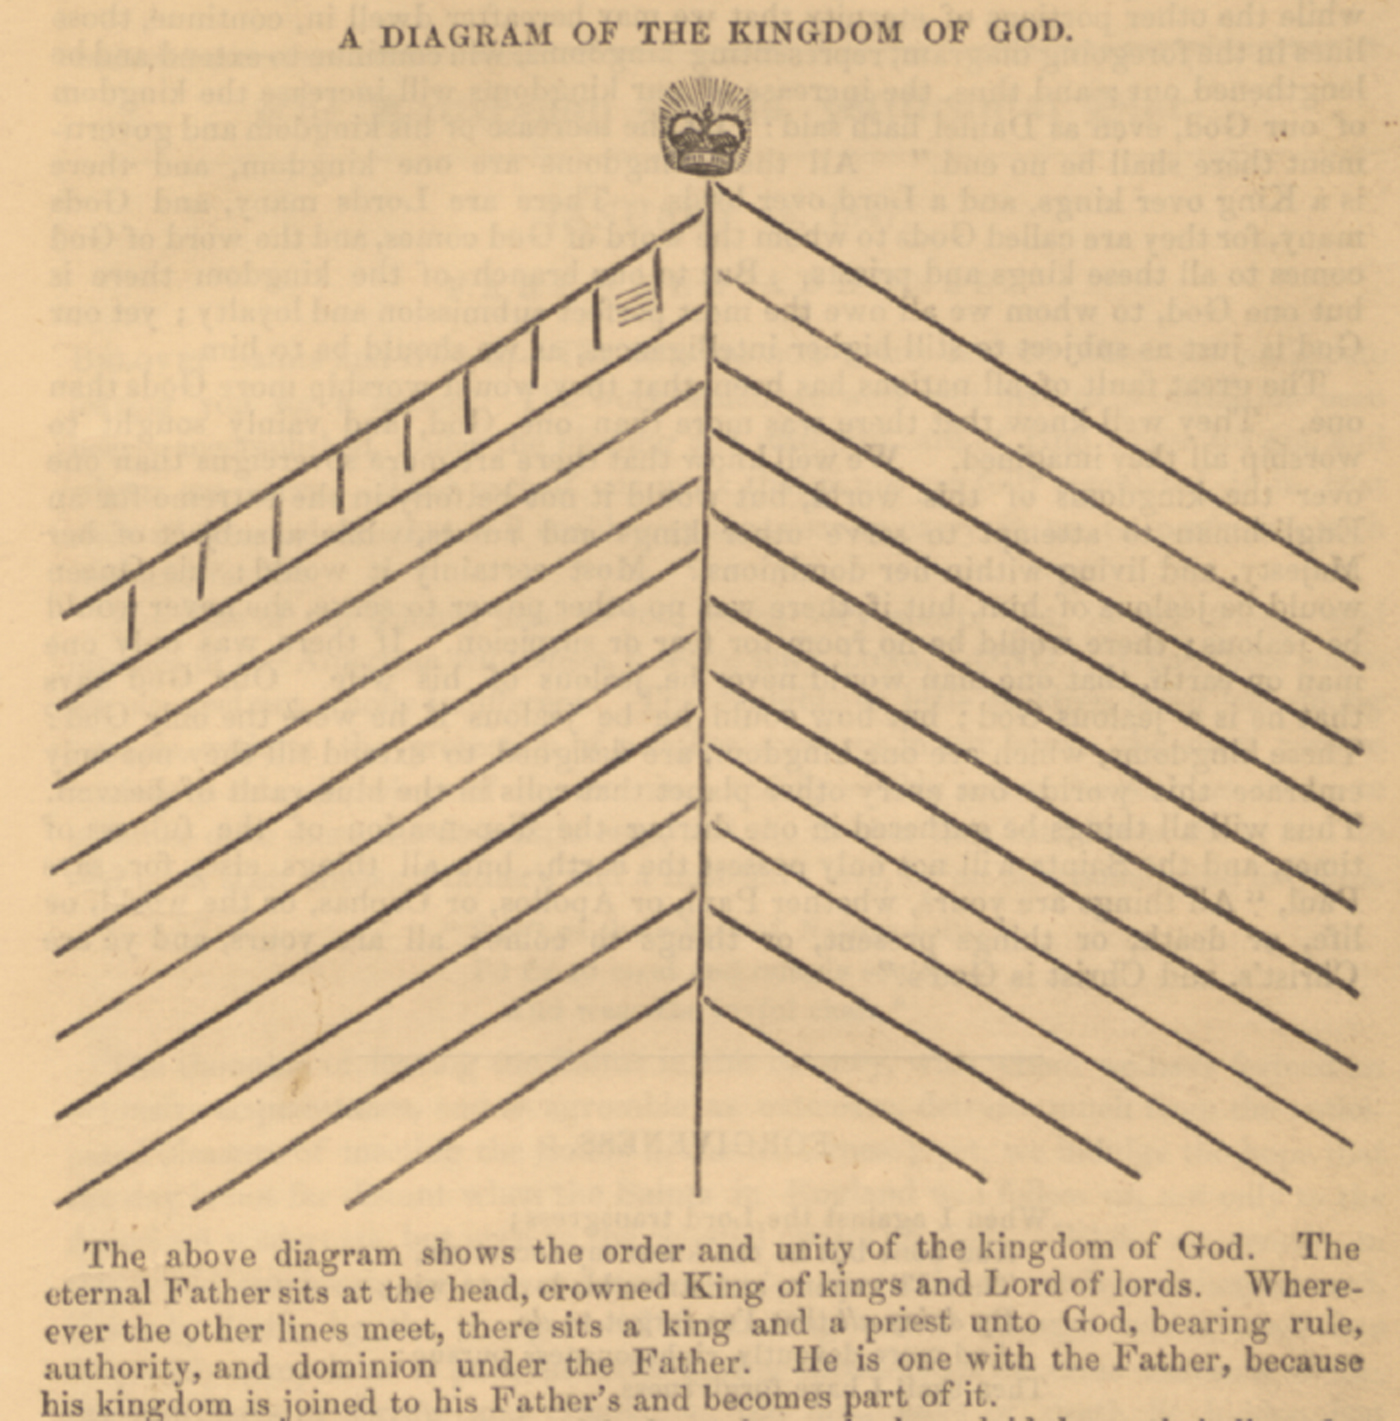 Joseph Smith's Kingdom of God: The Council of Fifty and the Mormon  Challenge to American Democratic Politics   Church History   Cambridge Core